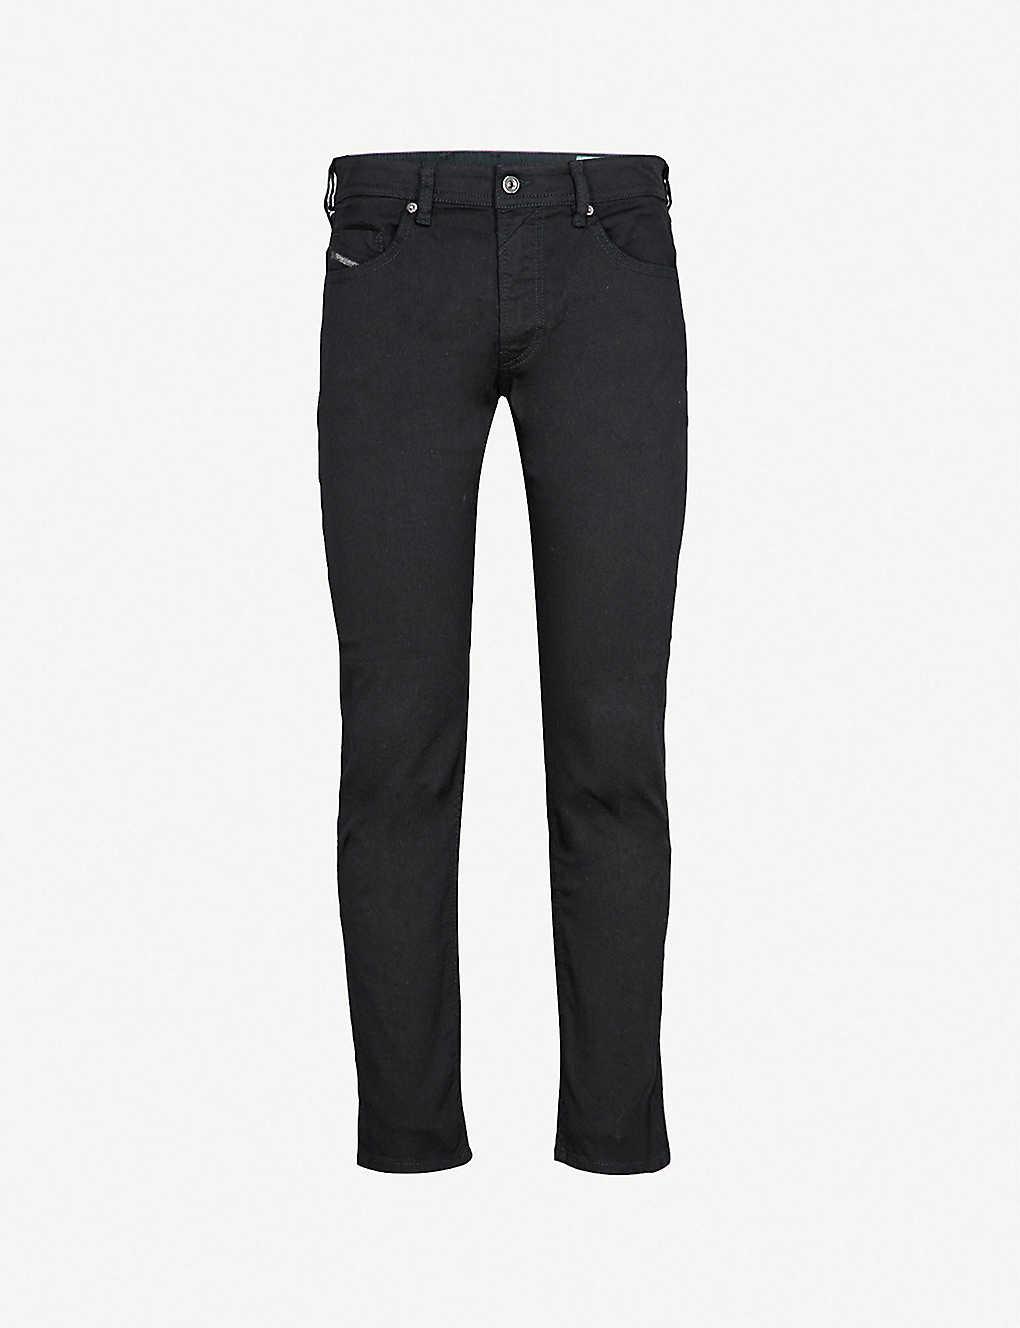 4dce3a63 DIESEL - Thommer slim-fit skinny jeans | Selfridges.com